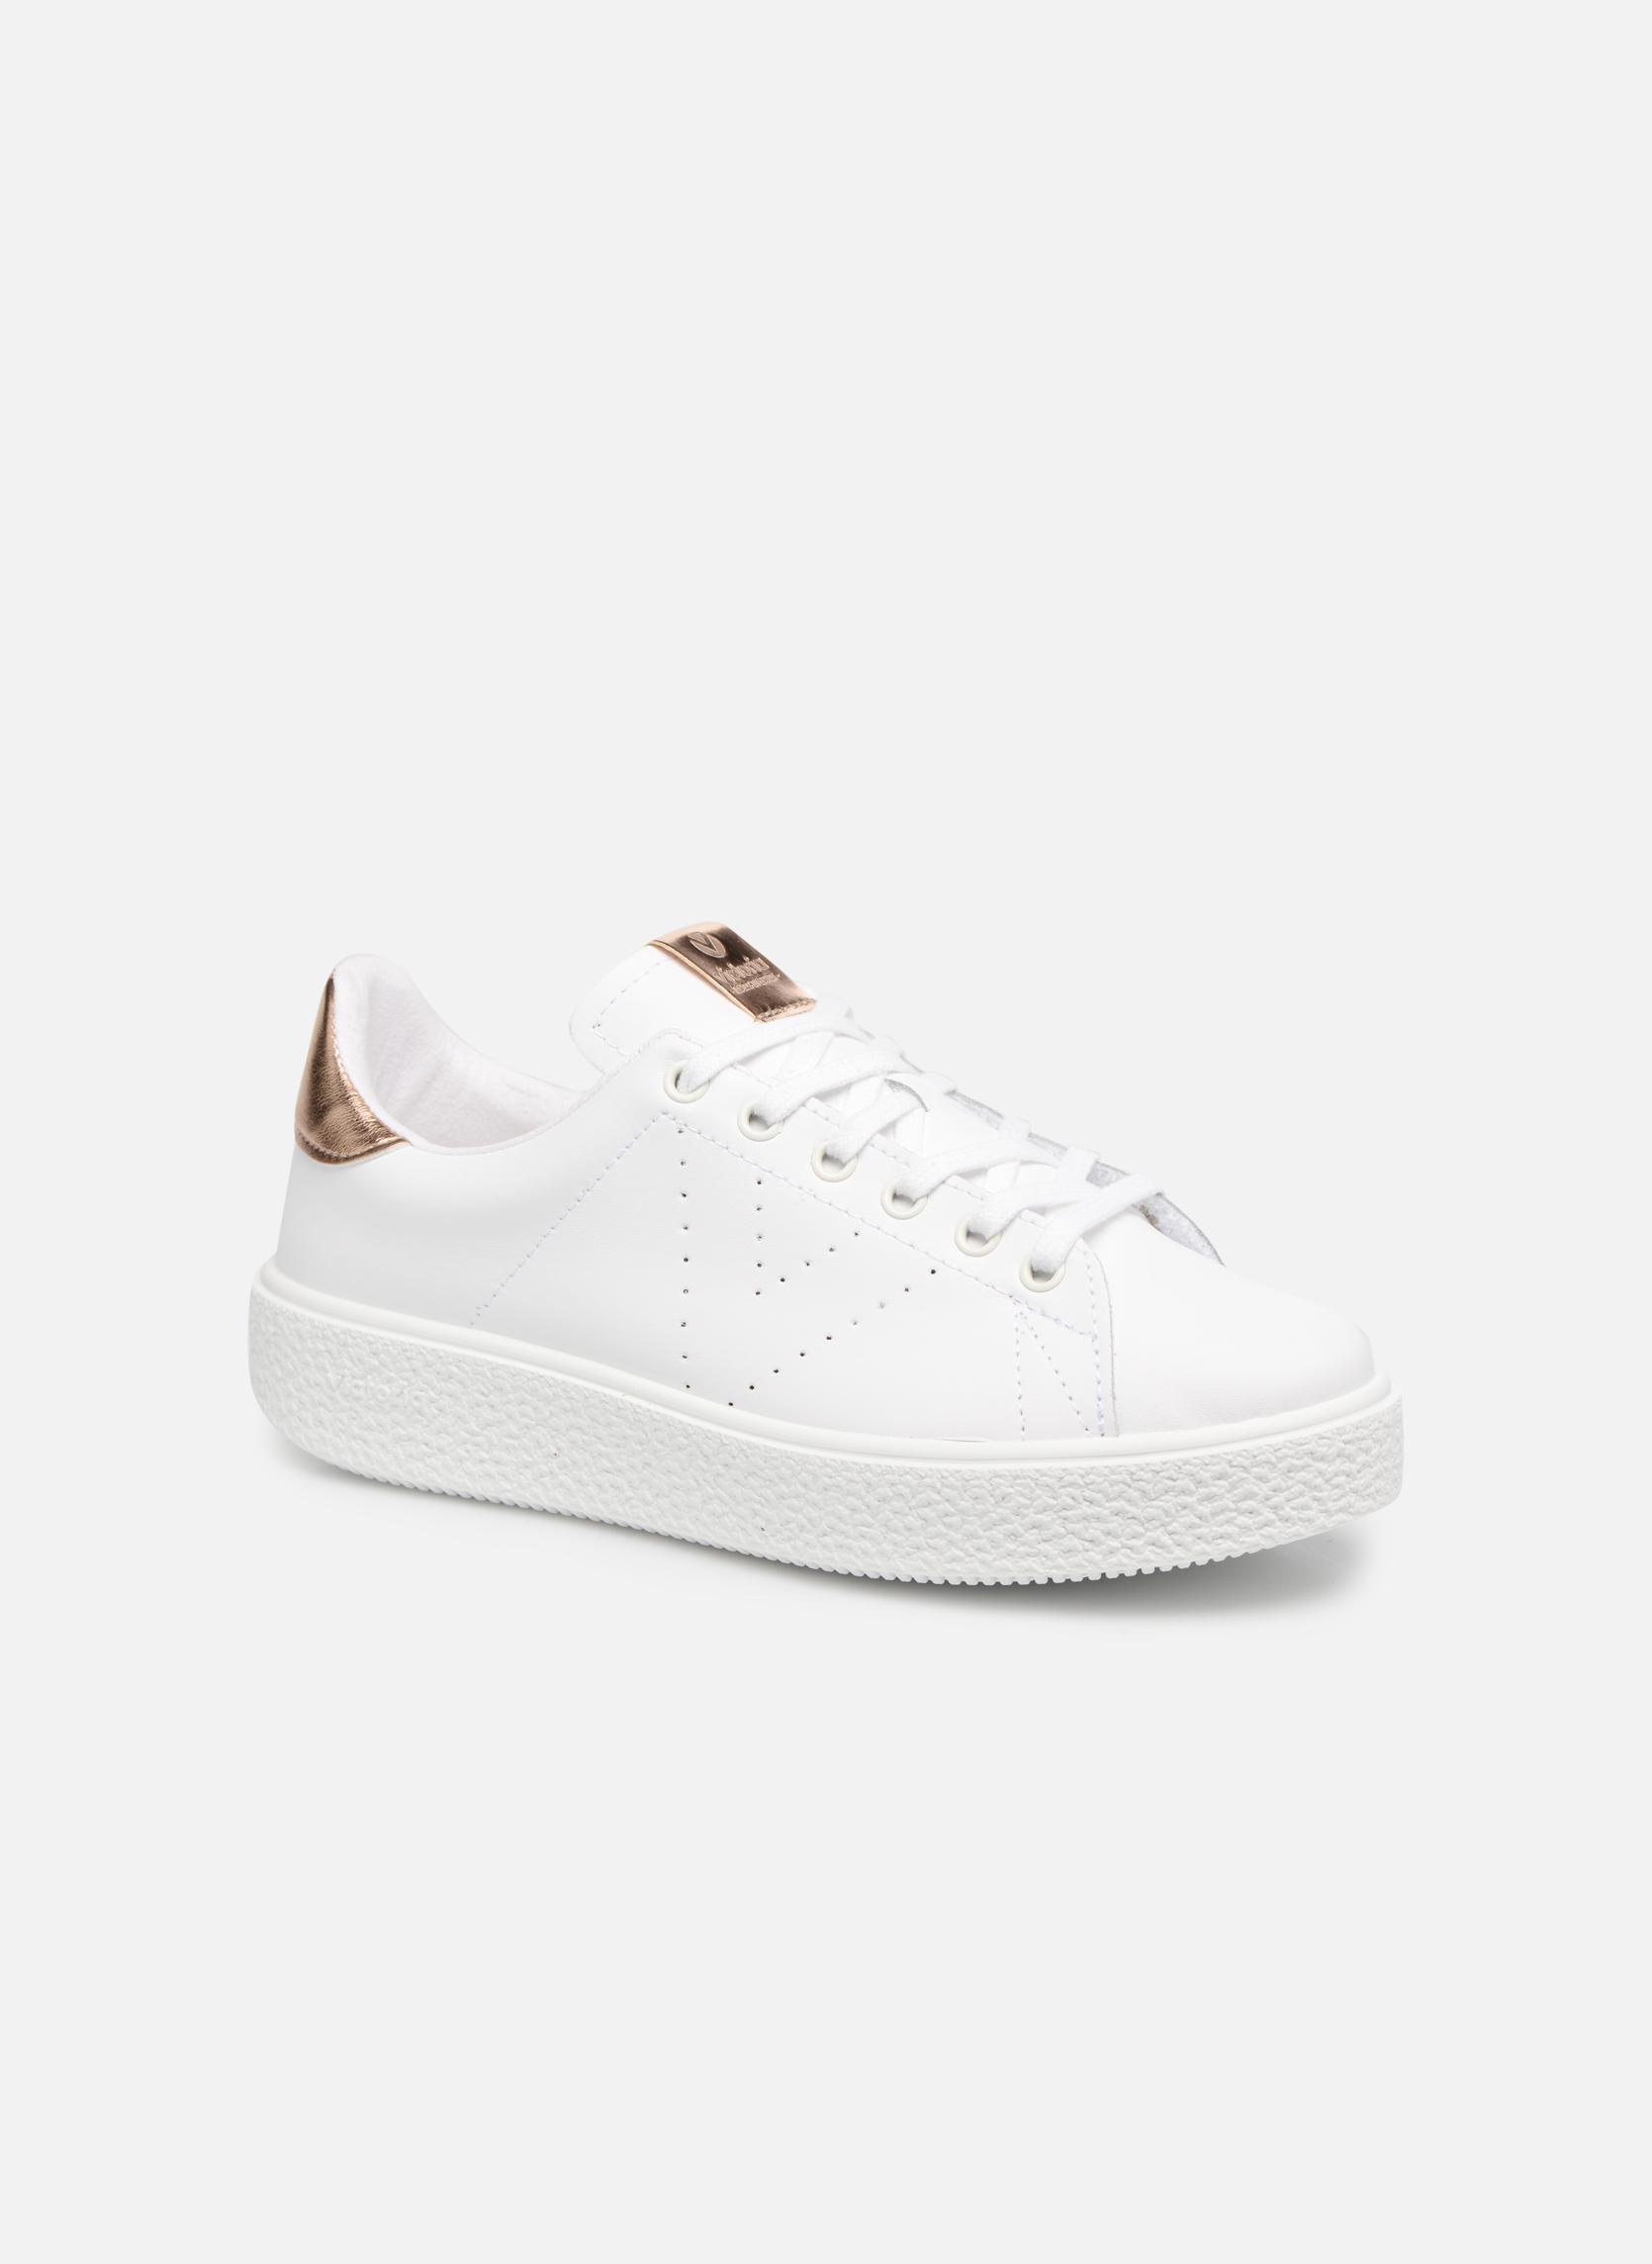 Sneakers Dames Deportivo Piel 2